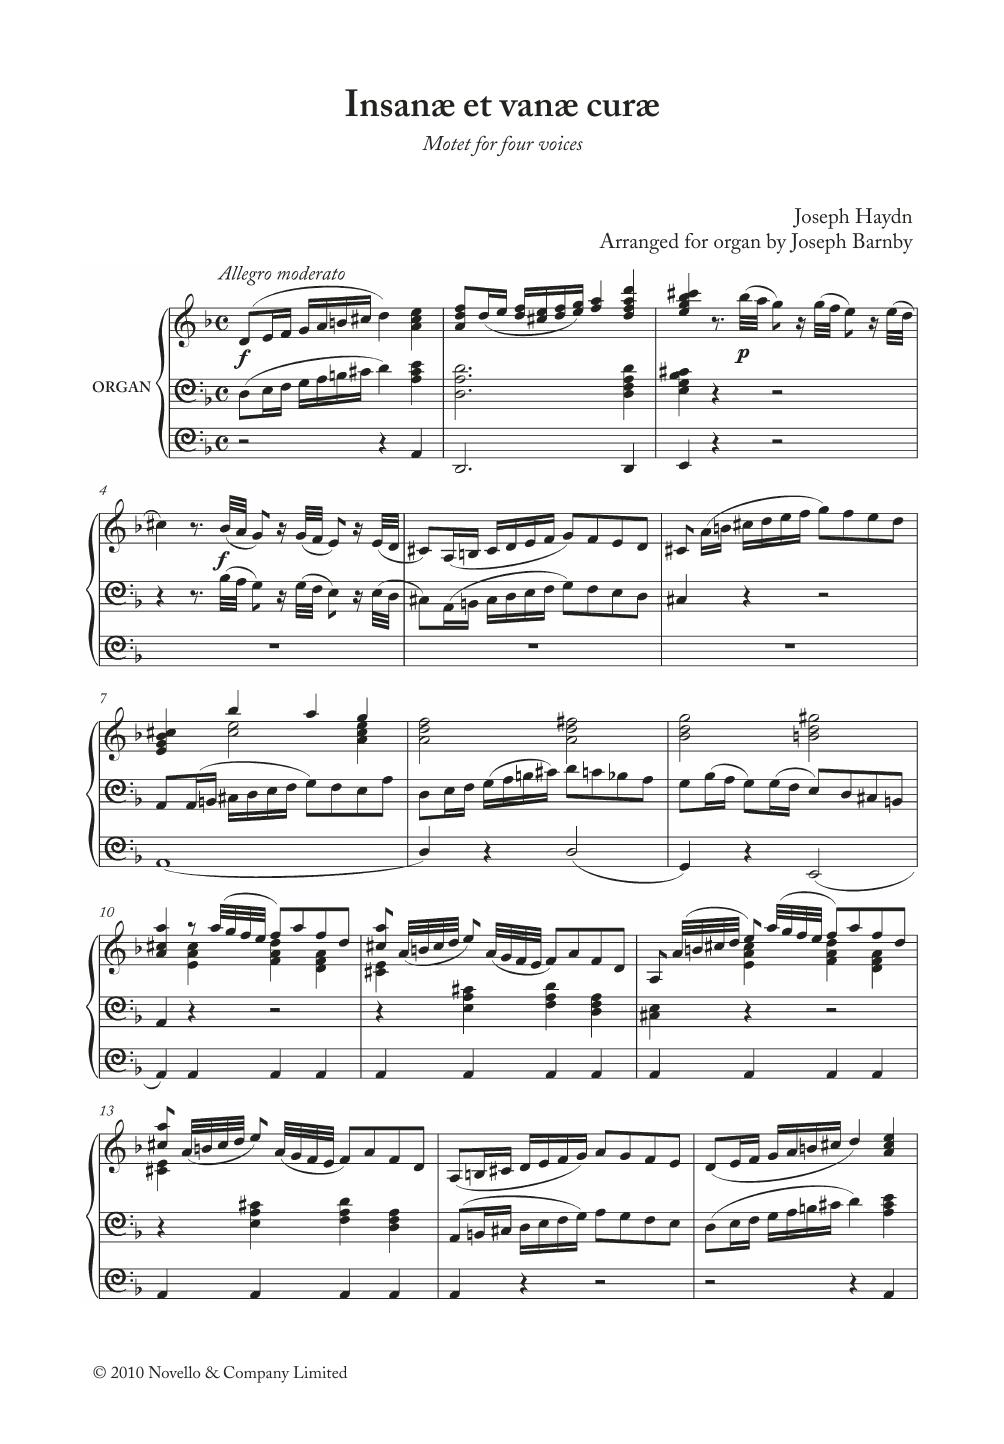 Insanae Et Vanae Curae Sheet Music